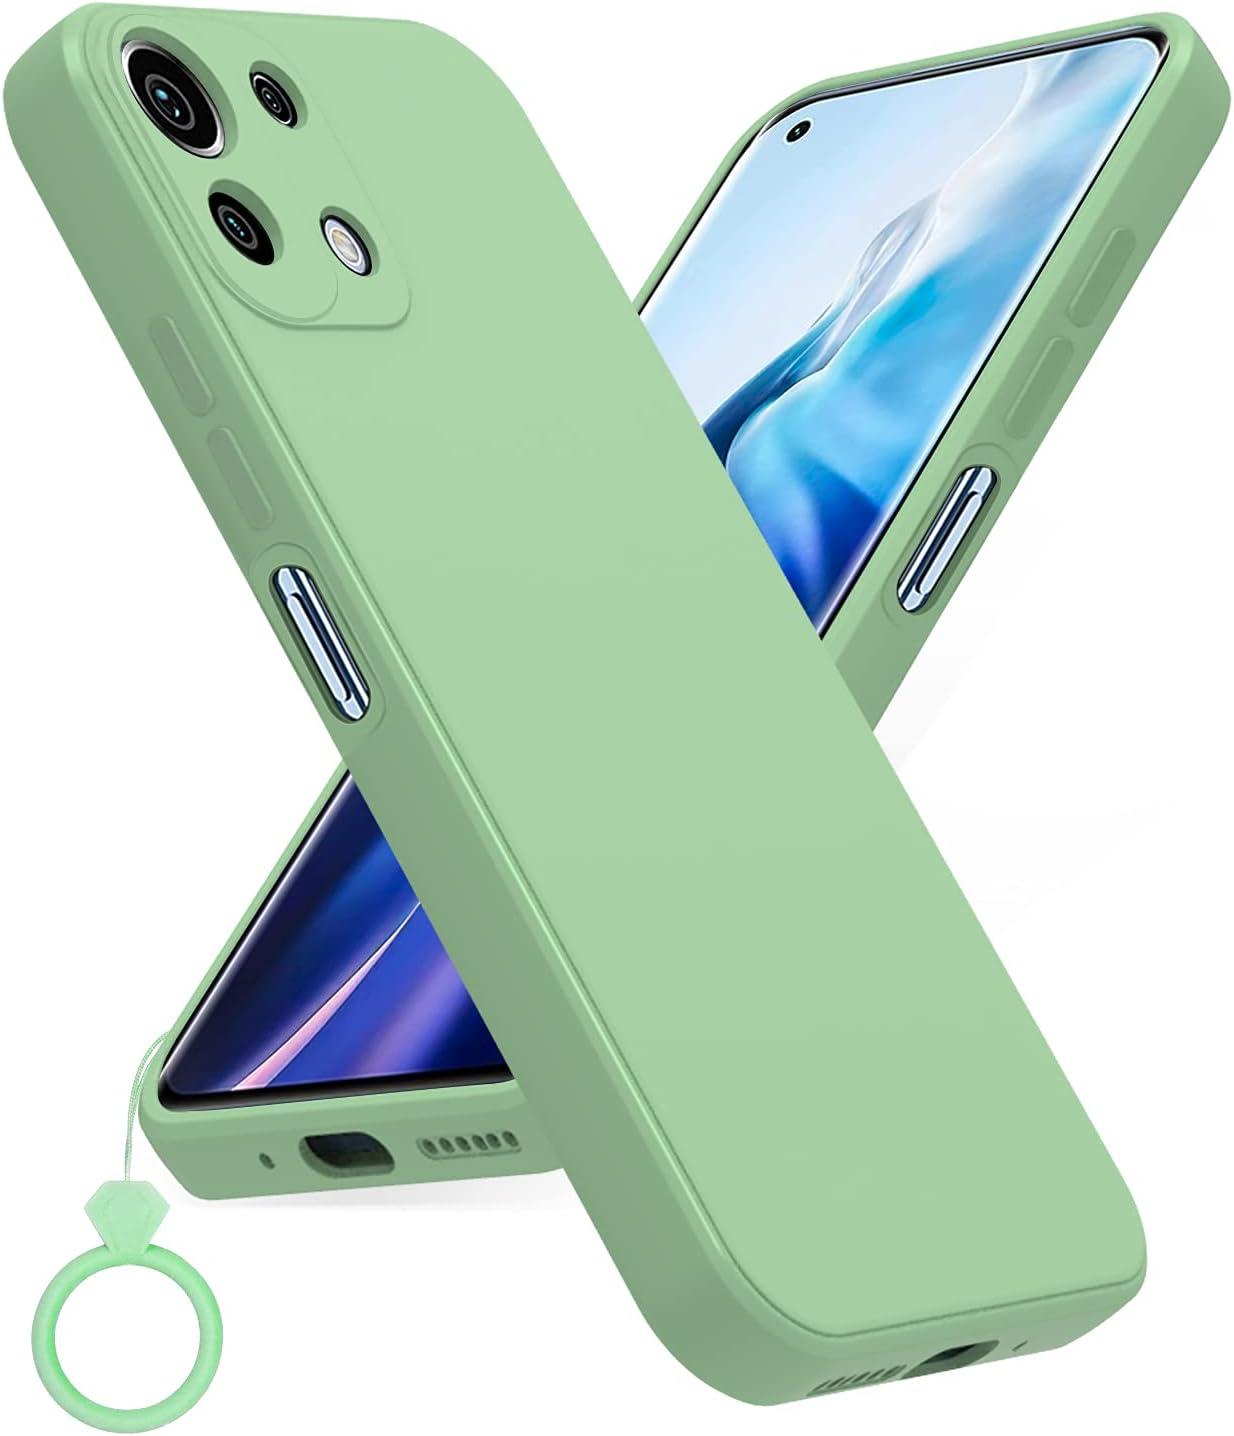 PULEN Funda para Xiaomi Mi 11 Lite 4G / 5G, Silicona Carcasa con Uno Silicona Dedo Anillo, Anti-Choques, Anti- Arañazos,Slim Delgada,Tacto Suave - MatchaGreen